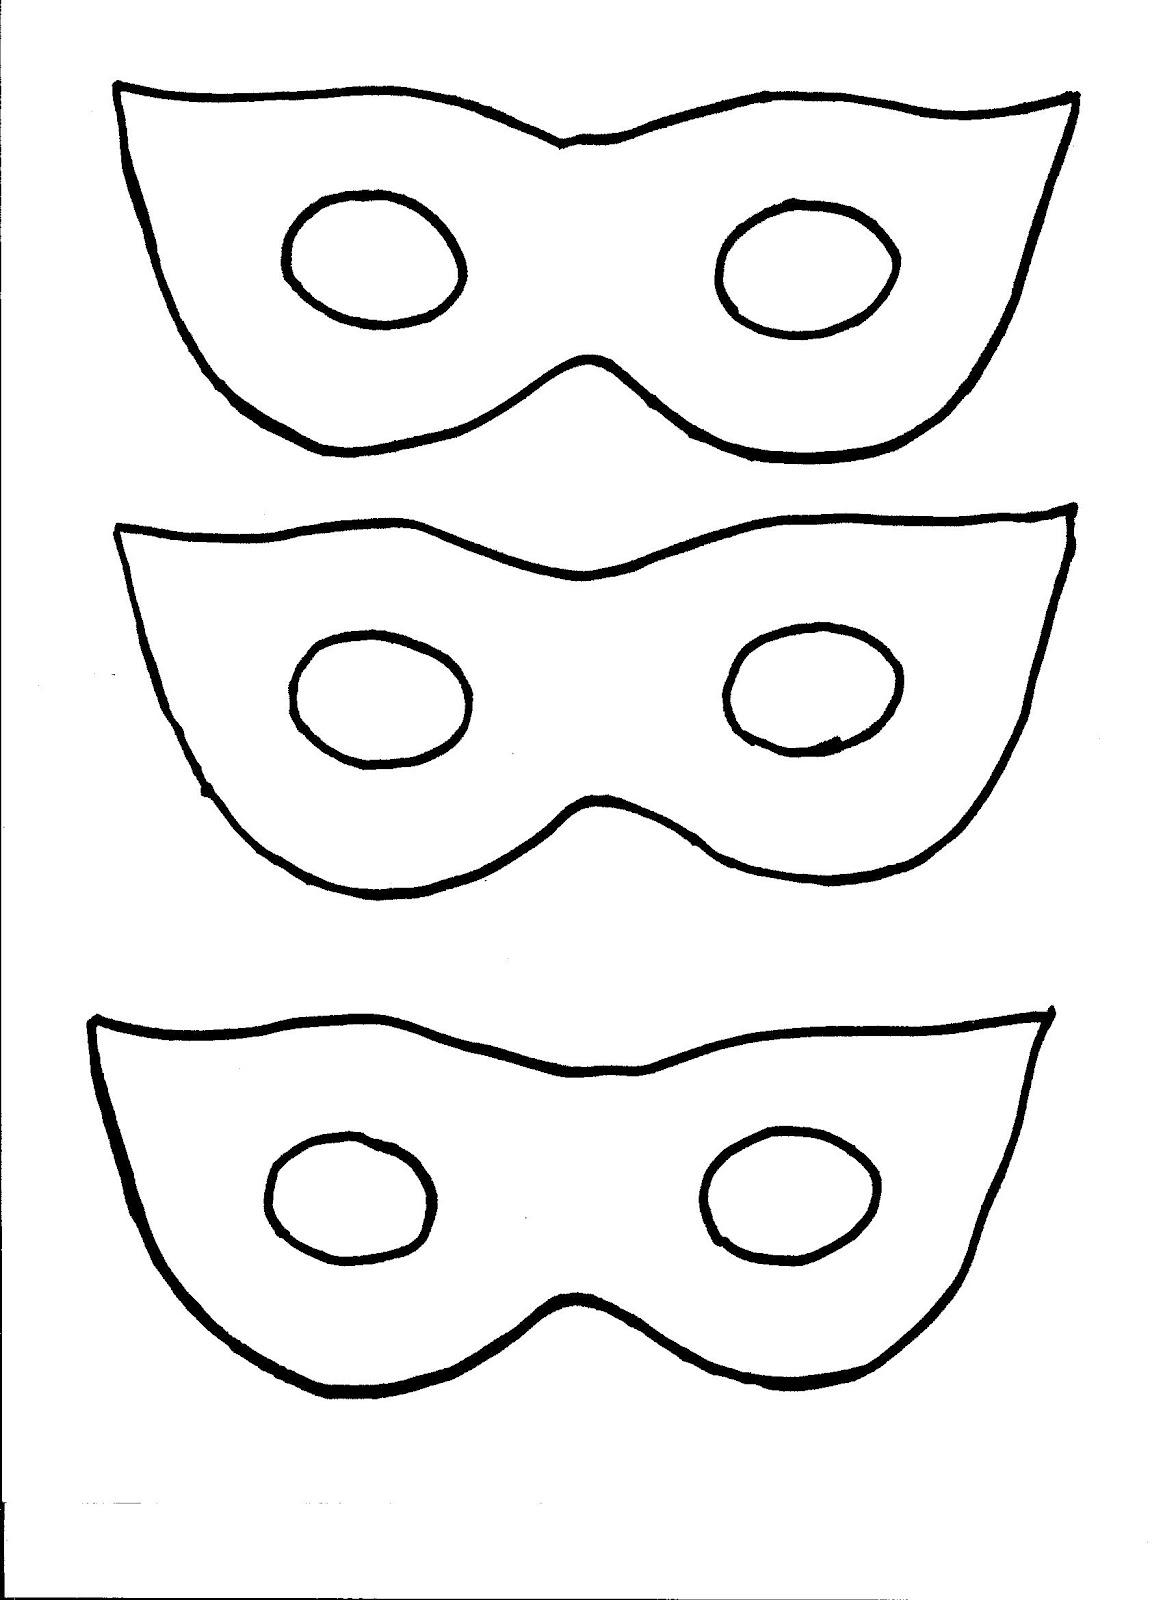 Printable Masquerade Masks Templates – Printable Mask Template